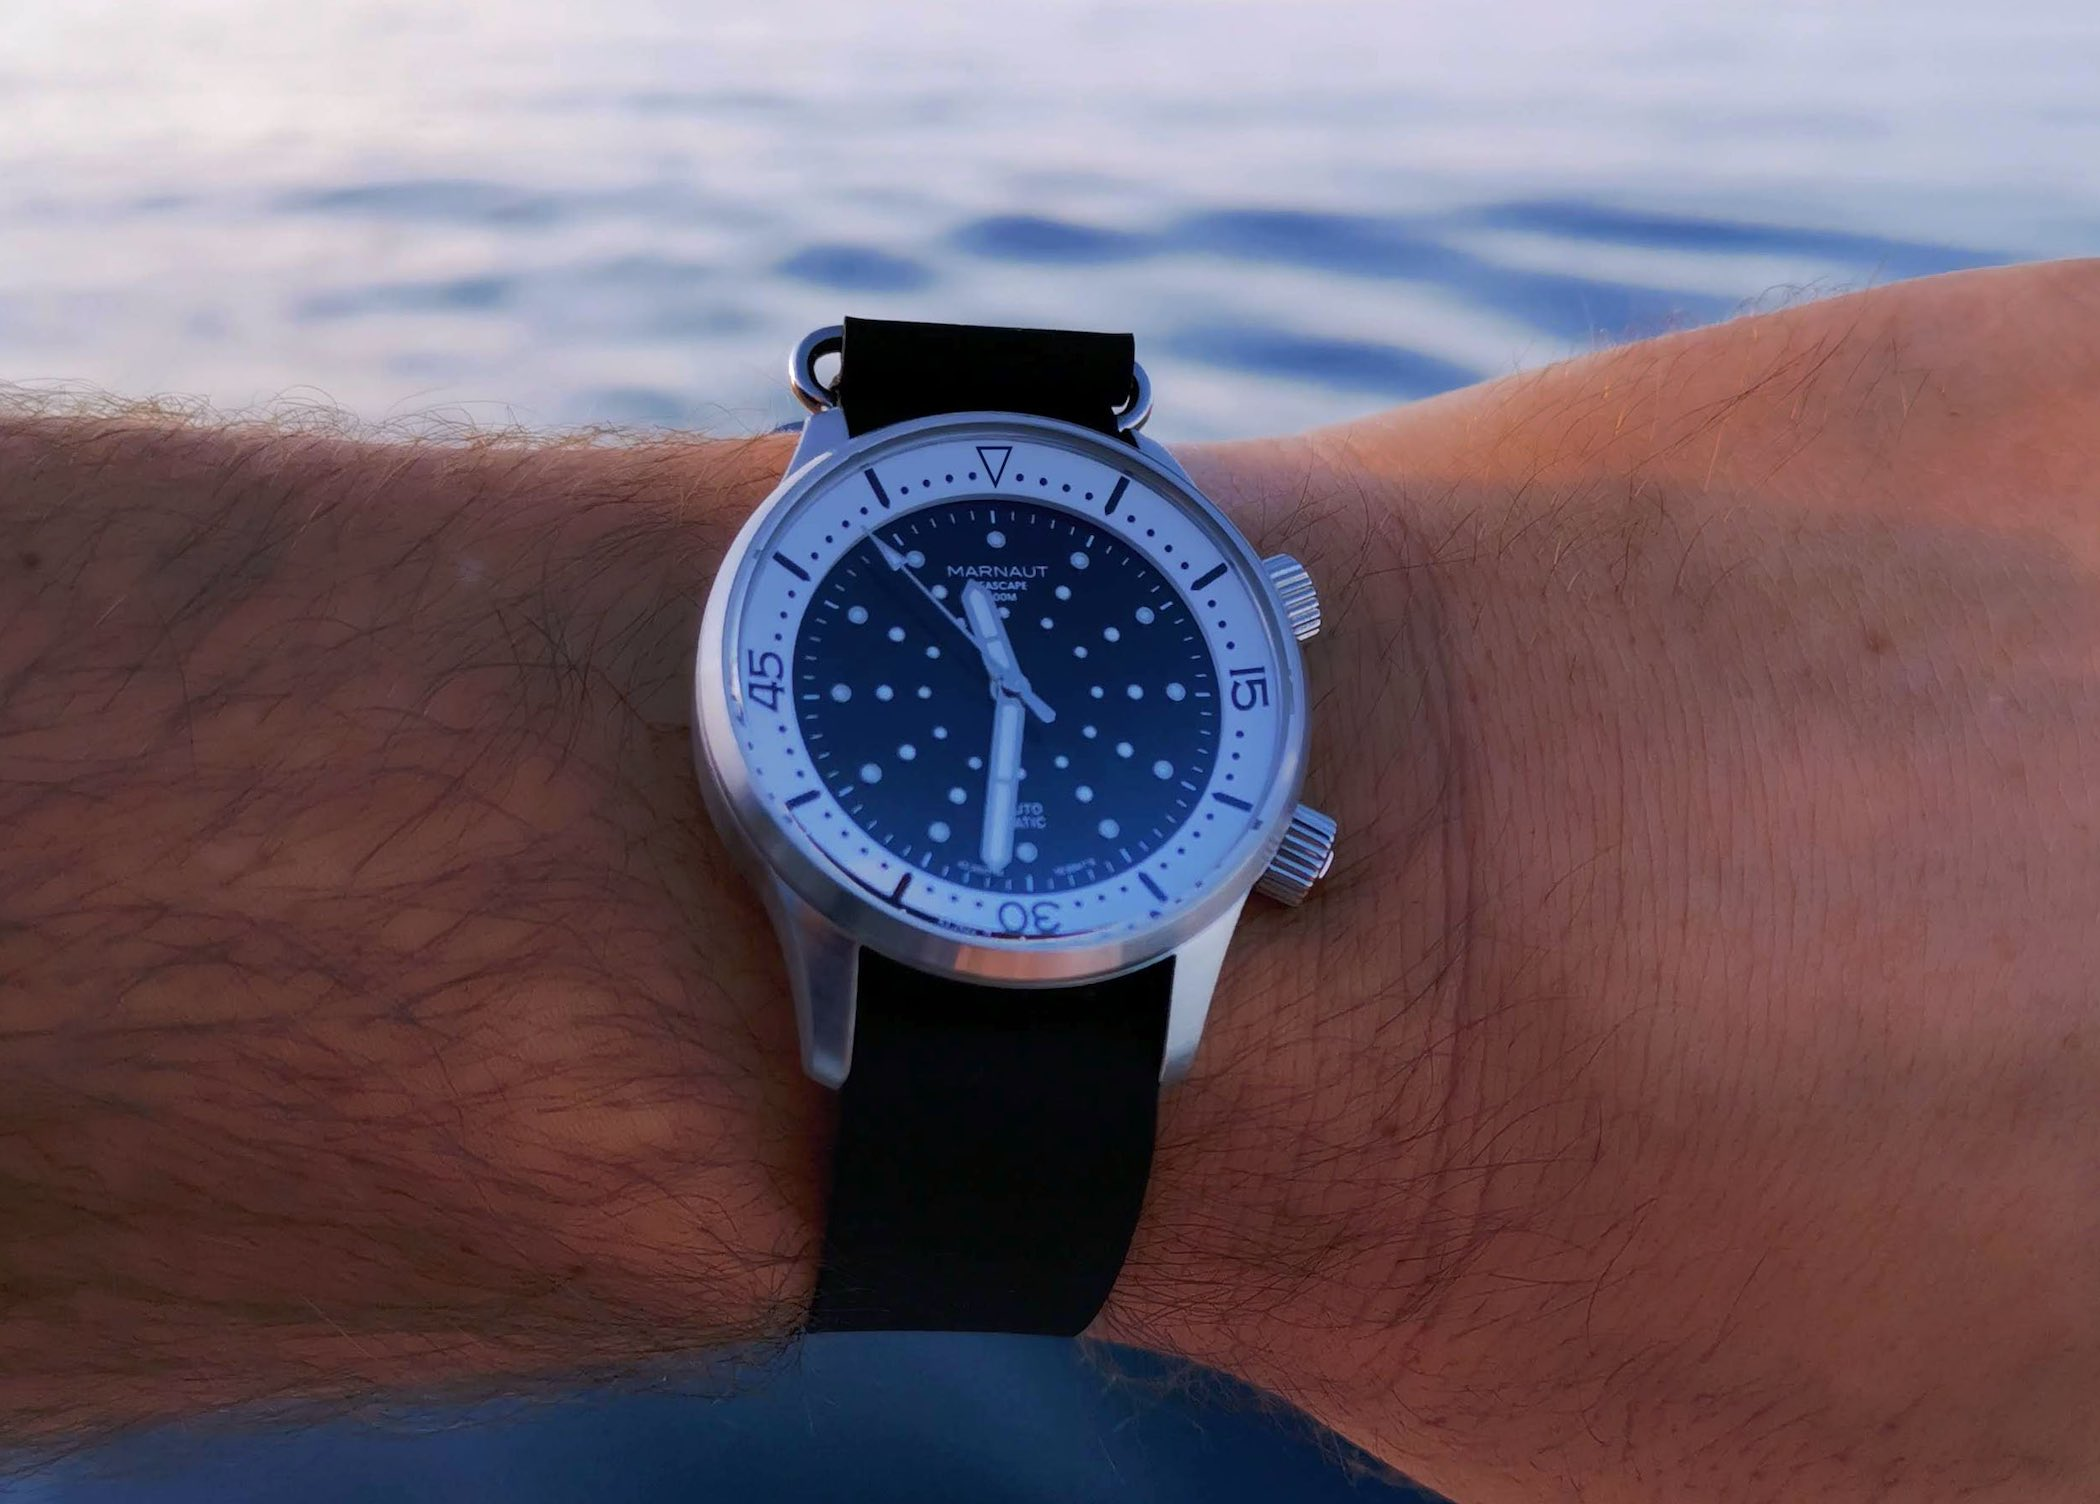 Marnaut Seascape 200 Compressor Dive Watch